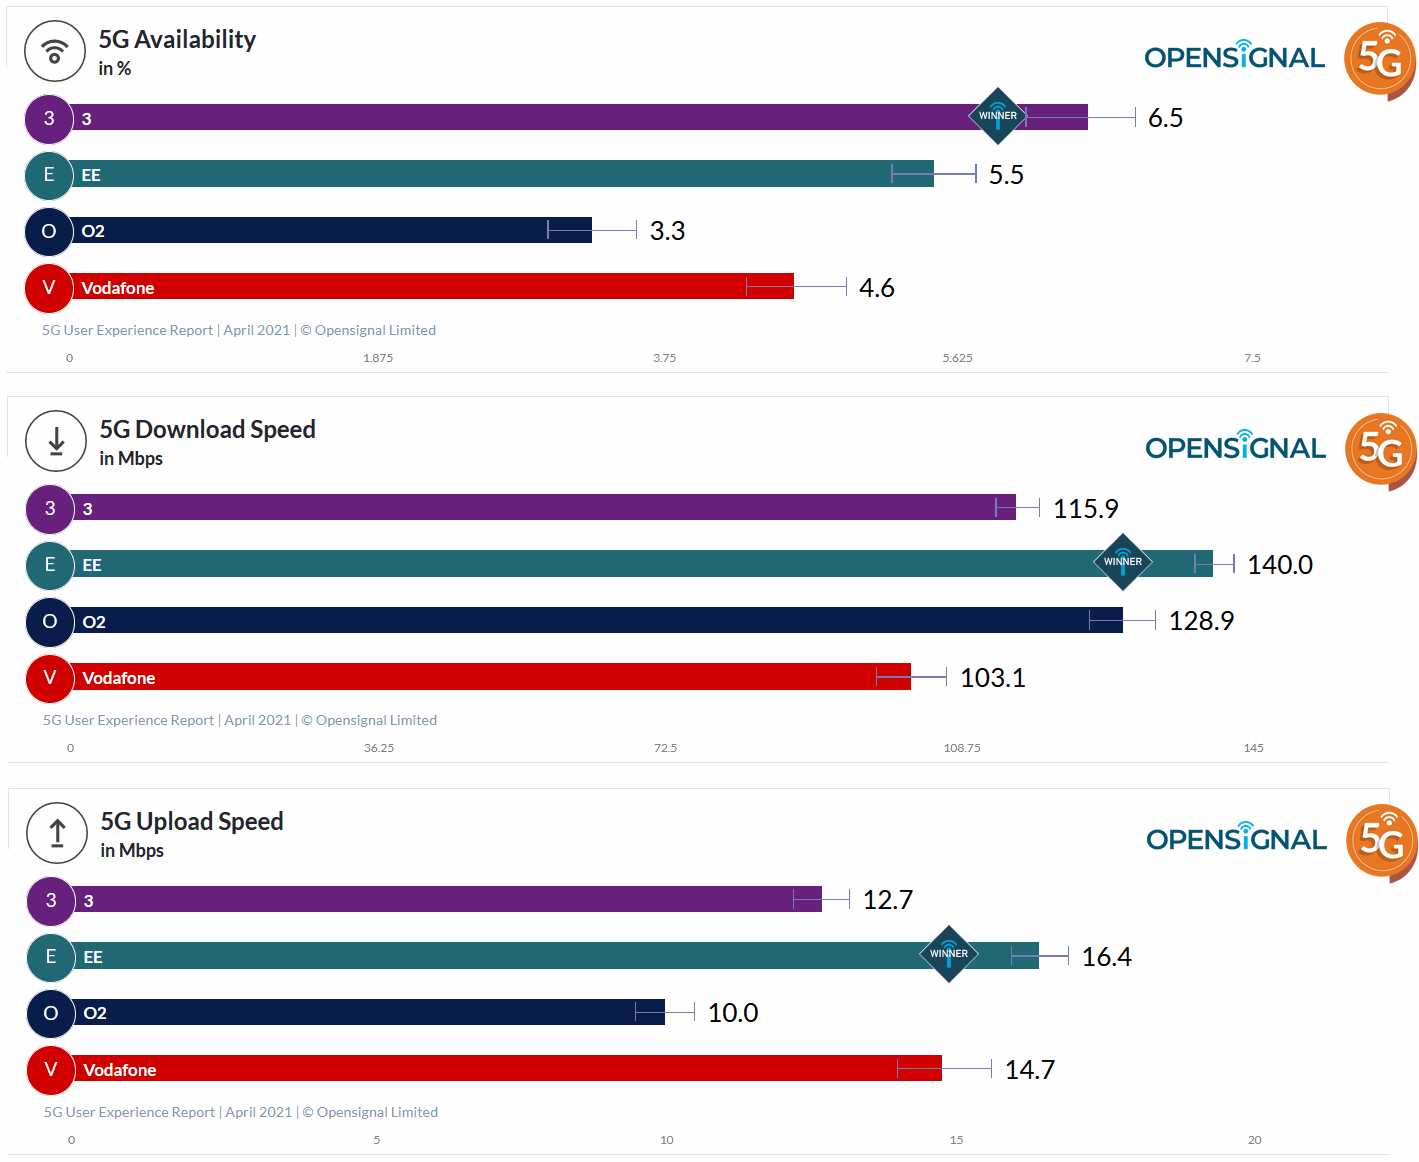 opensignal_uk_5g_performance_april_2021